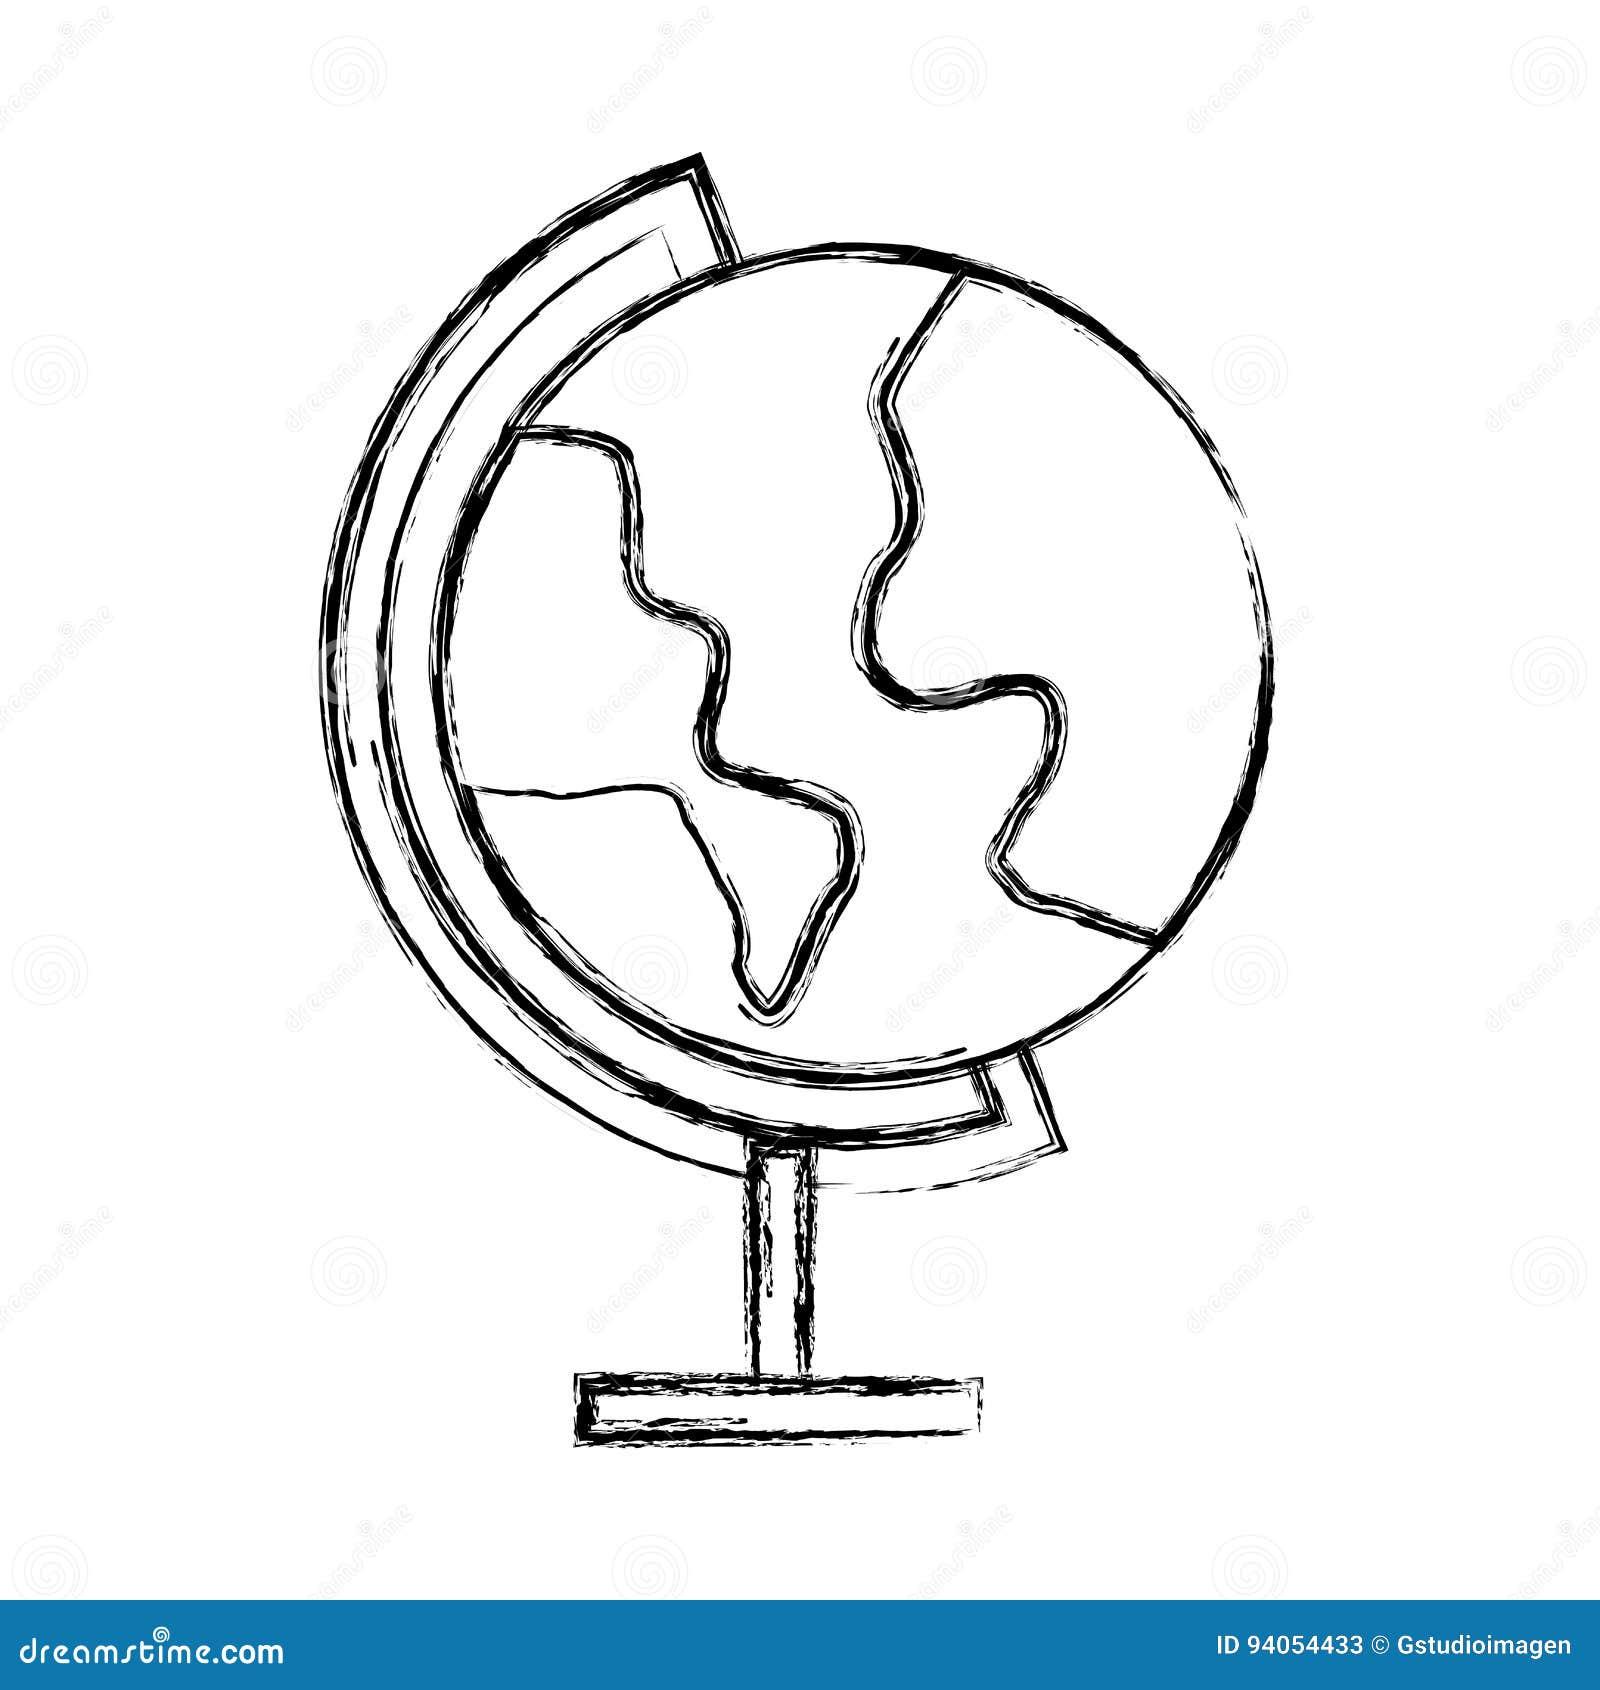 Sketch Draw World Map Cartoon Stock Vector - Illustration of ...